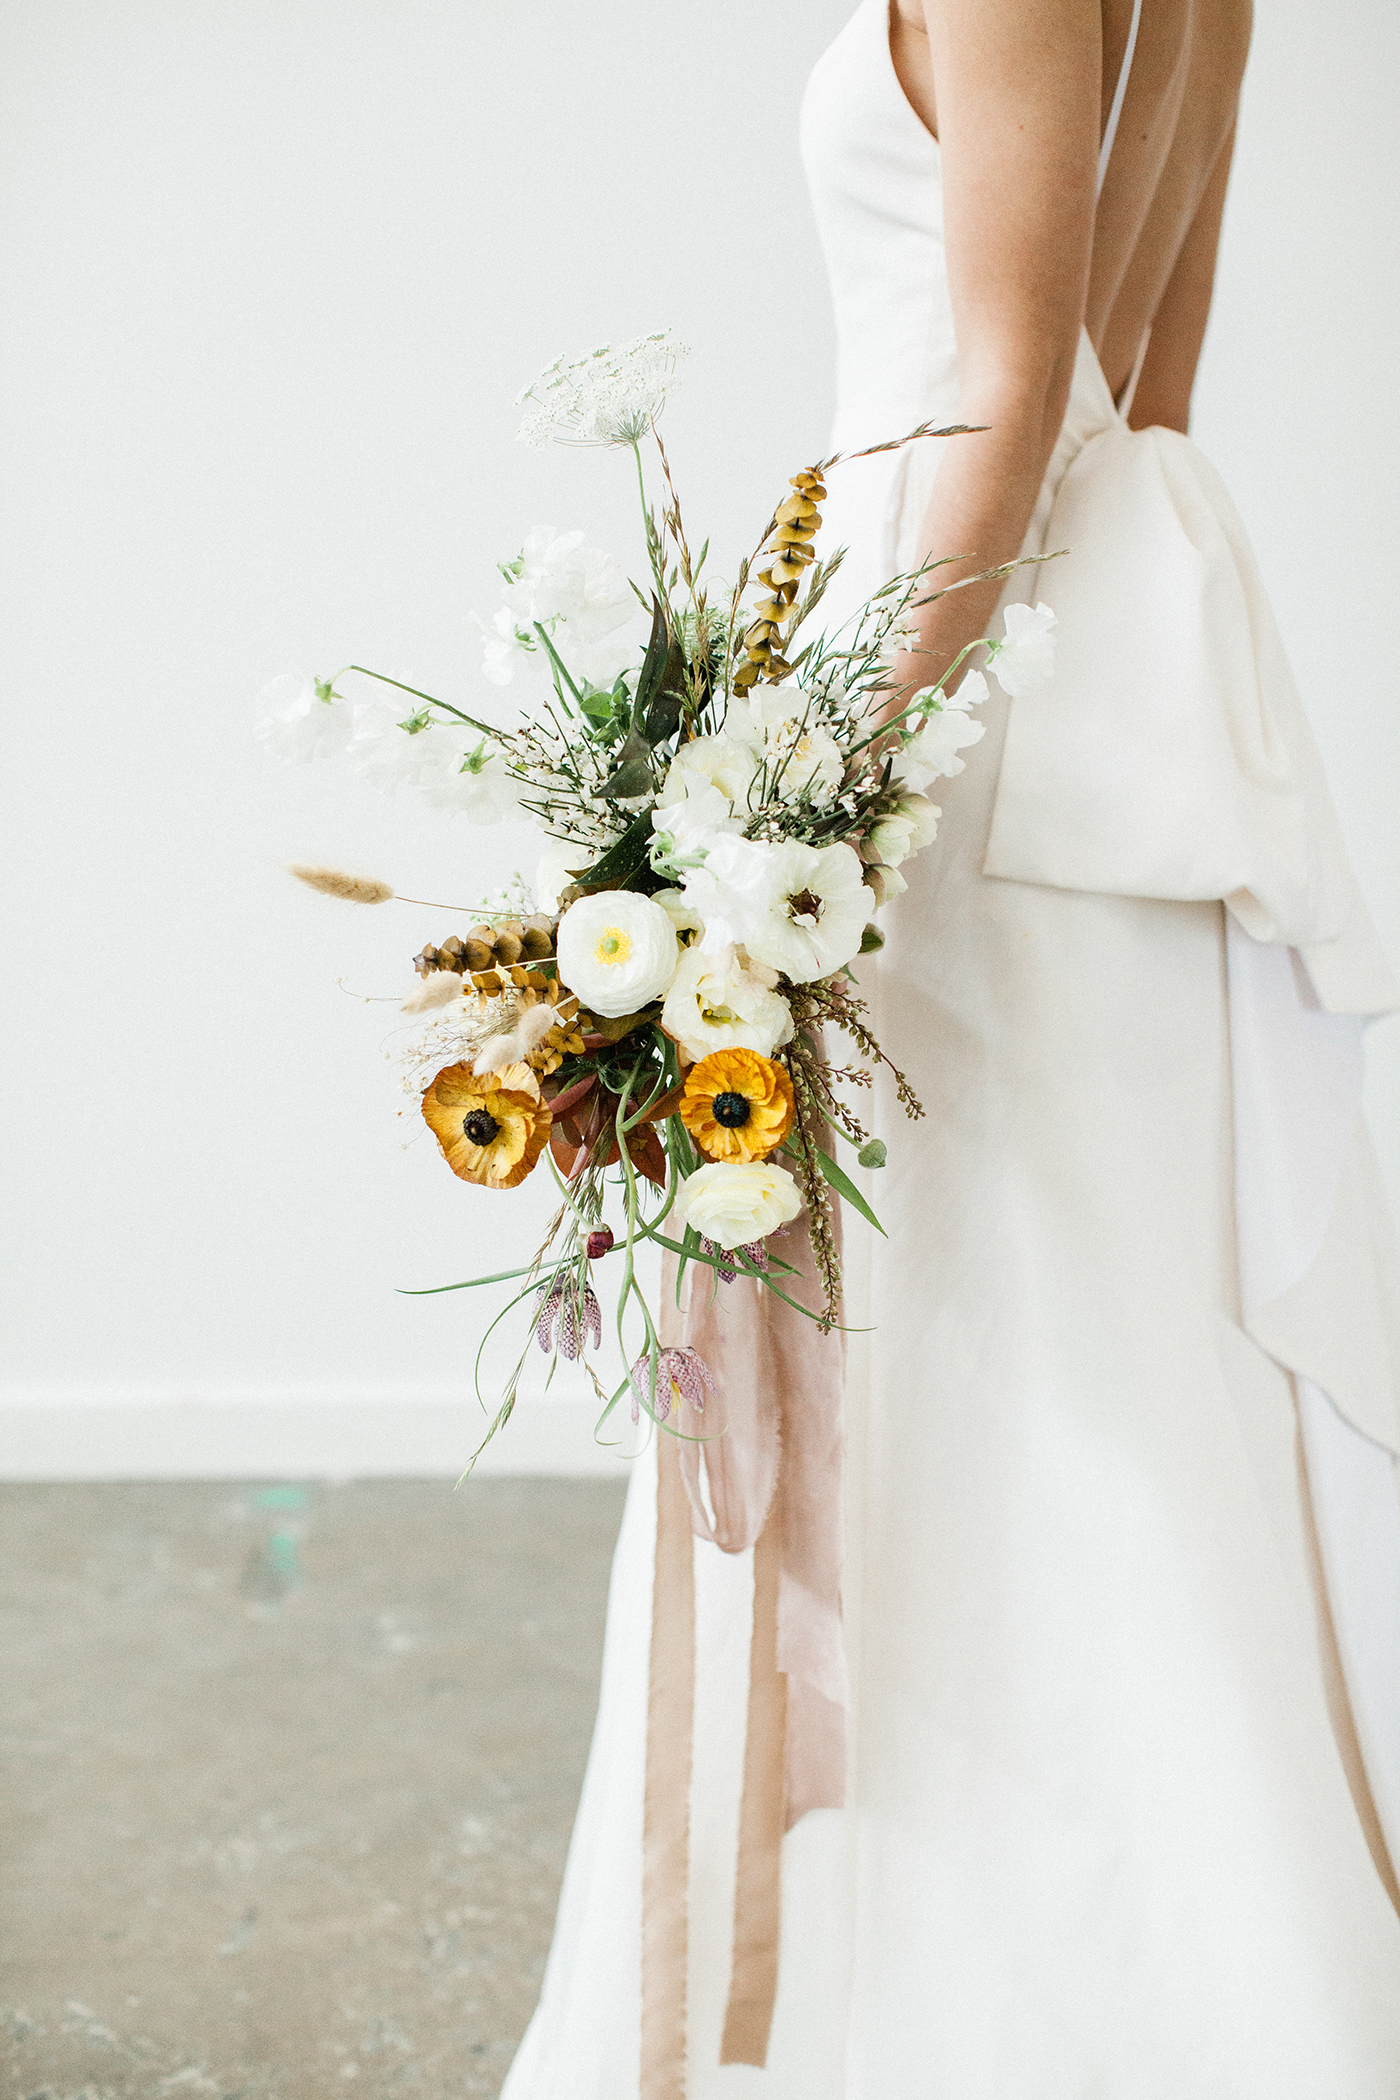 Wedding Floral Design Dallas - Olive Grove Design - Mimimalist Fall Wedding - 00062.jpg